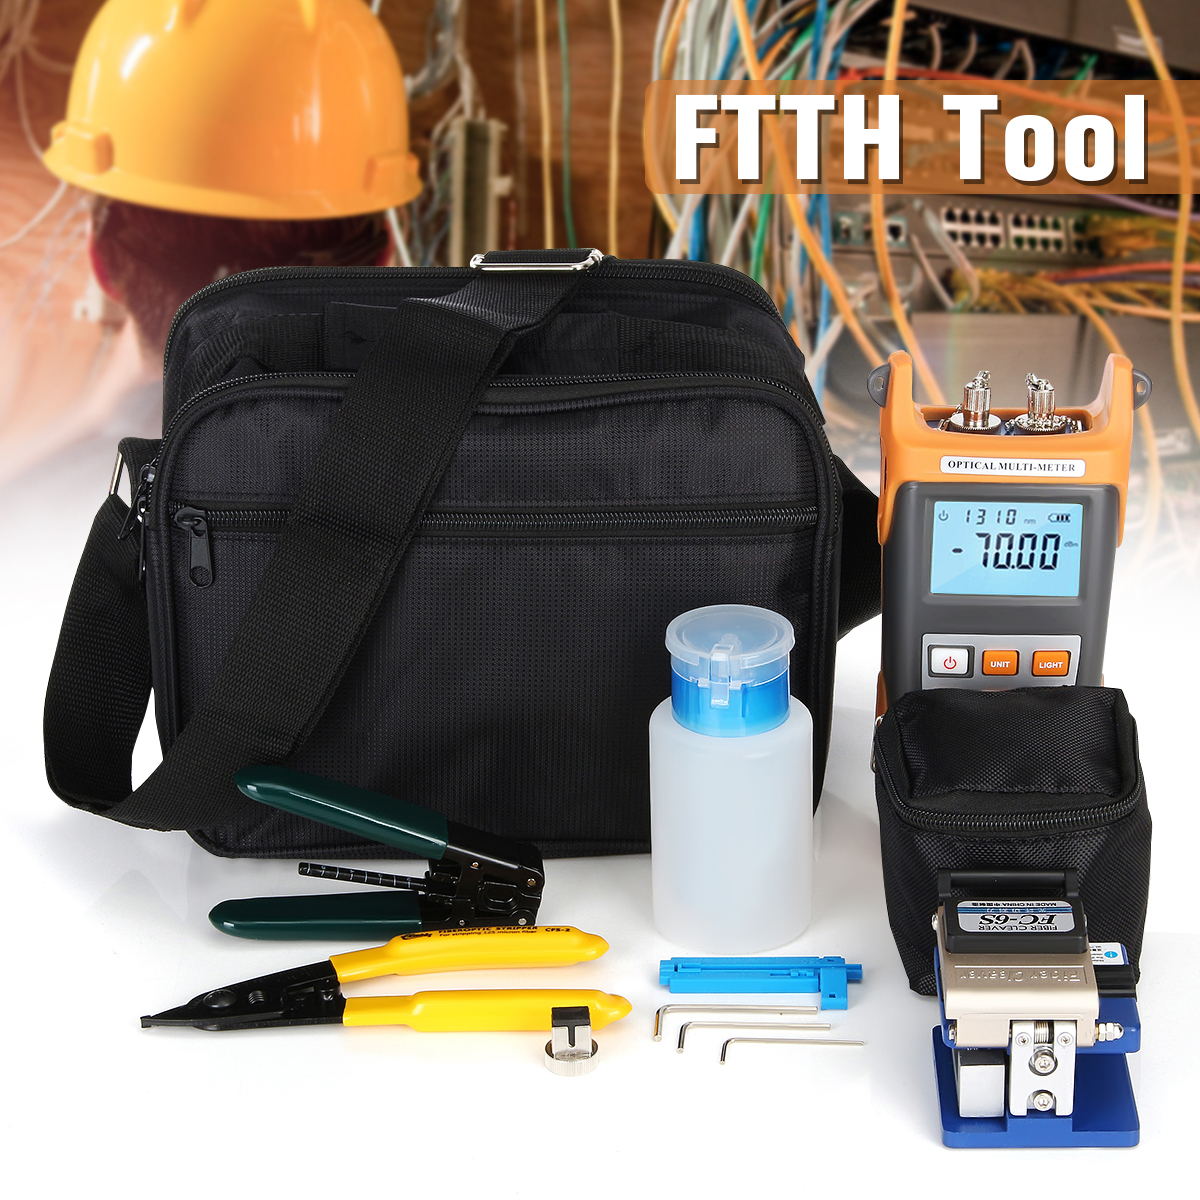 FTTH Tool Kit Visibile Fault Locator Fibra Ottica Power Meter Tester Mannaia Pinza